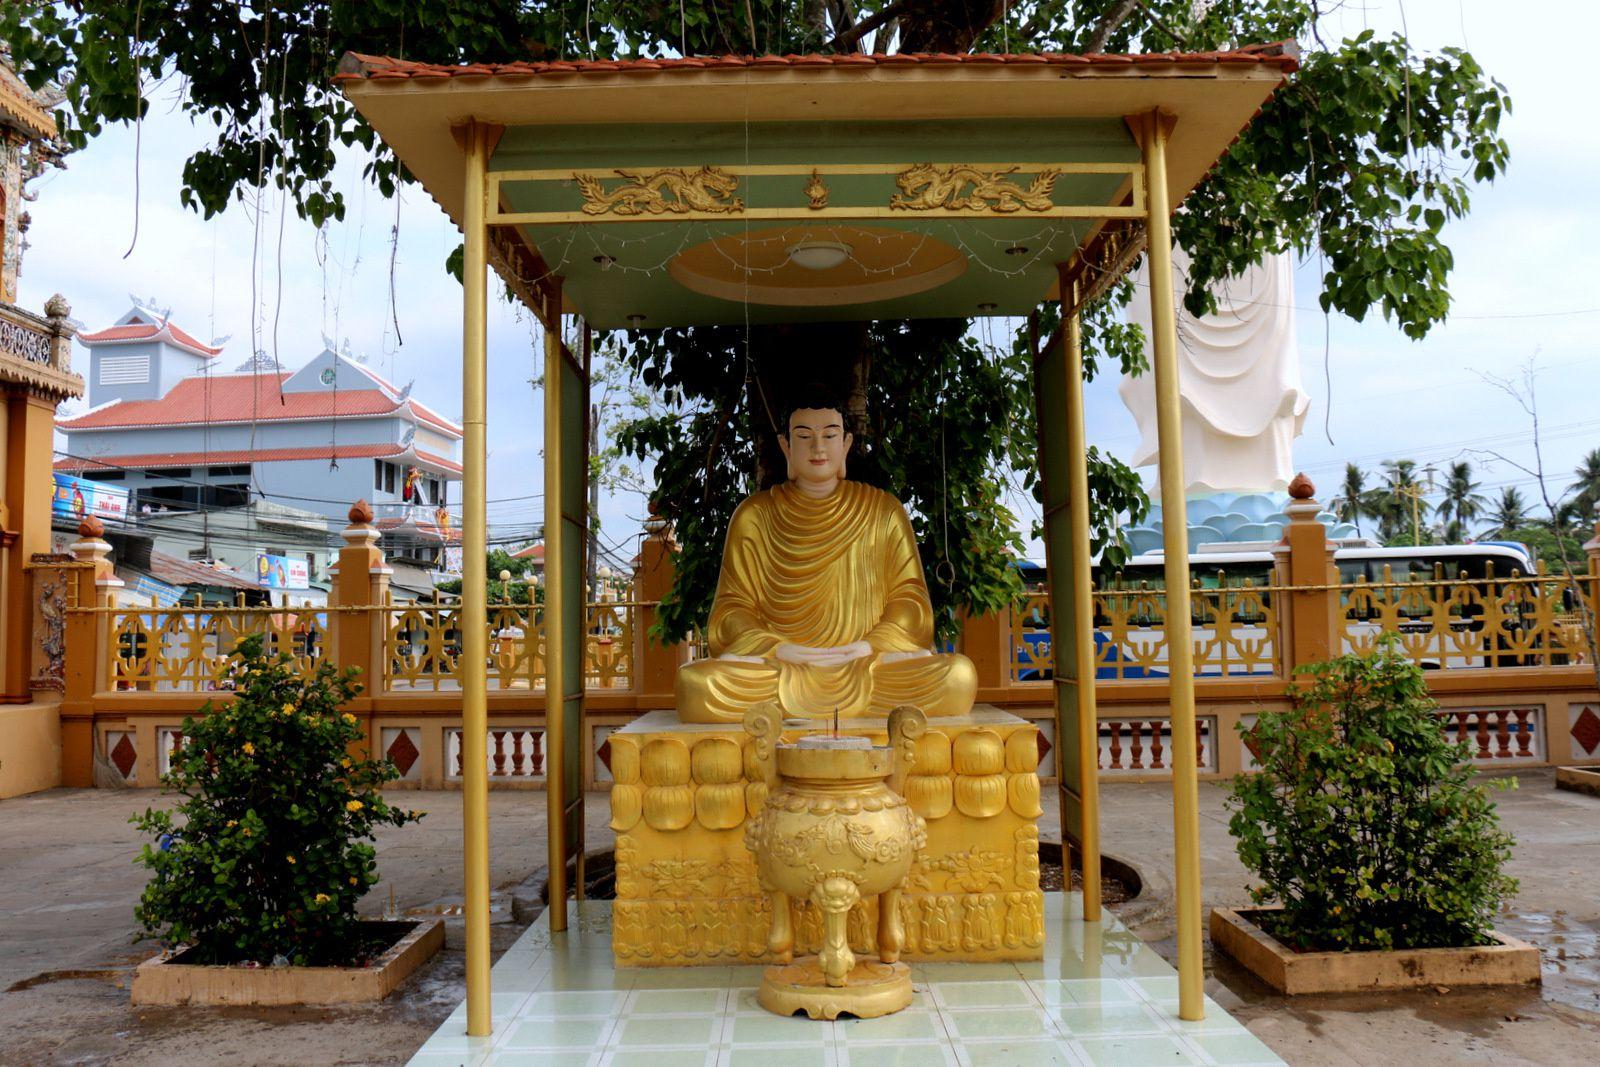 Les Bouddhas du jardin de la pagode de Vinh Trang, Vietnam